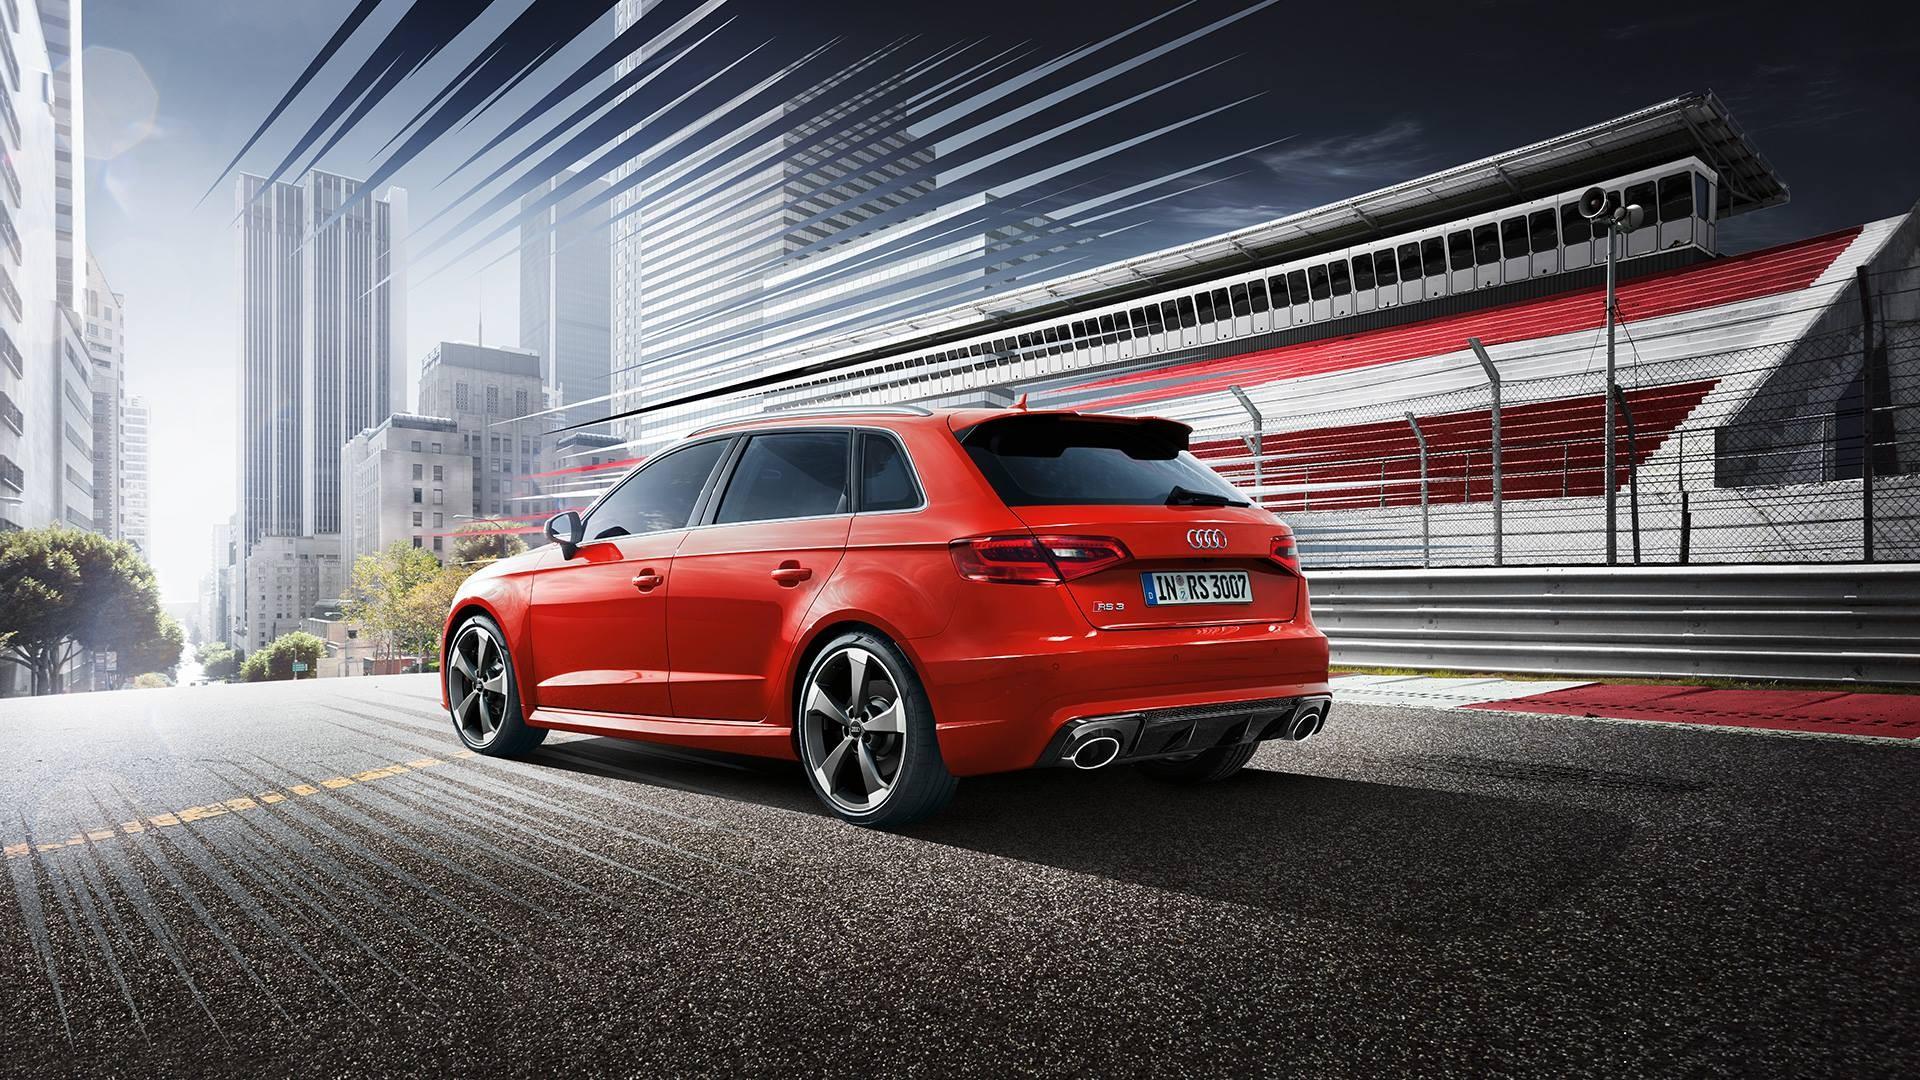 Audi, Audi RS3, Car, Red Cars Wallpapers HD / Desktop and Mobile ...